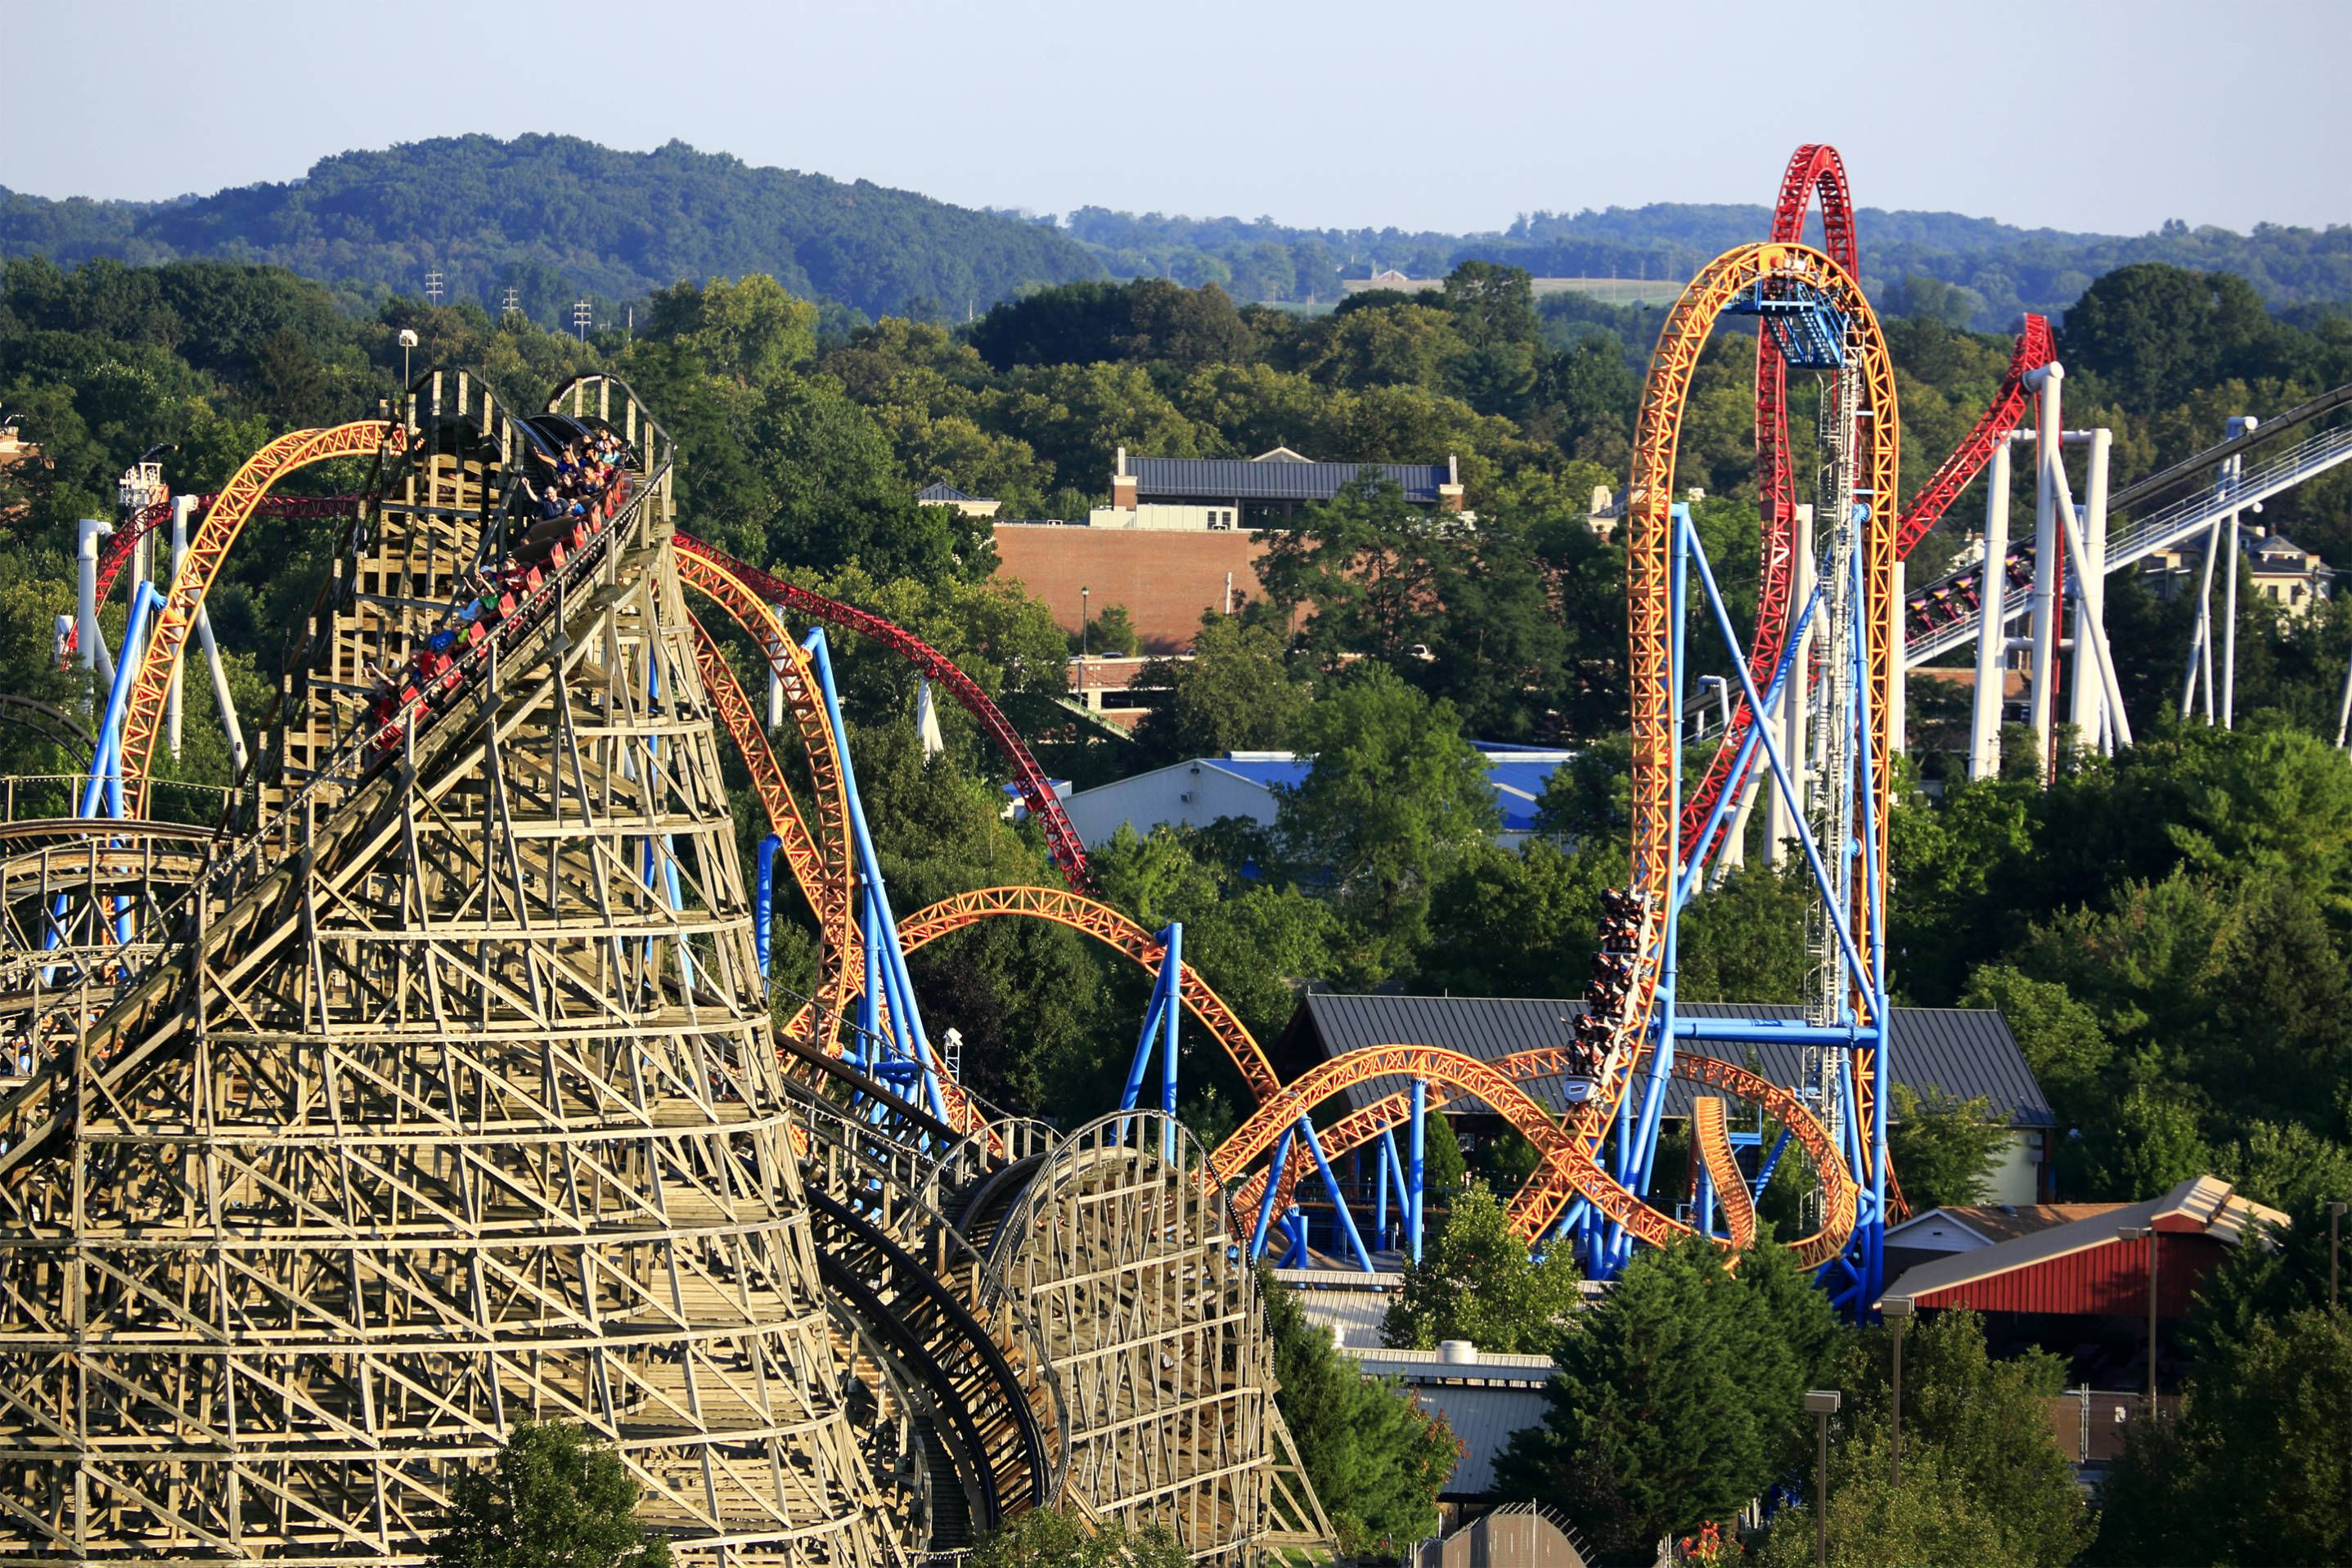 hersheypark-rollercoaster